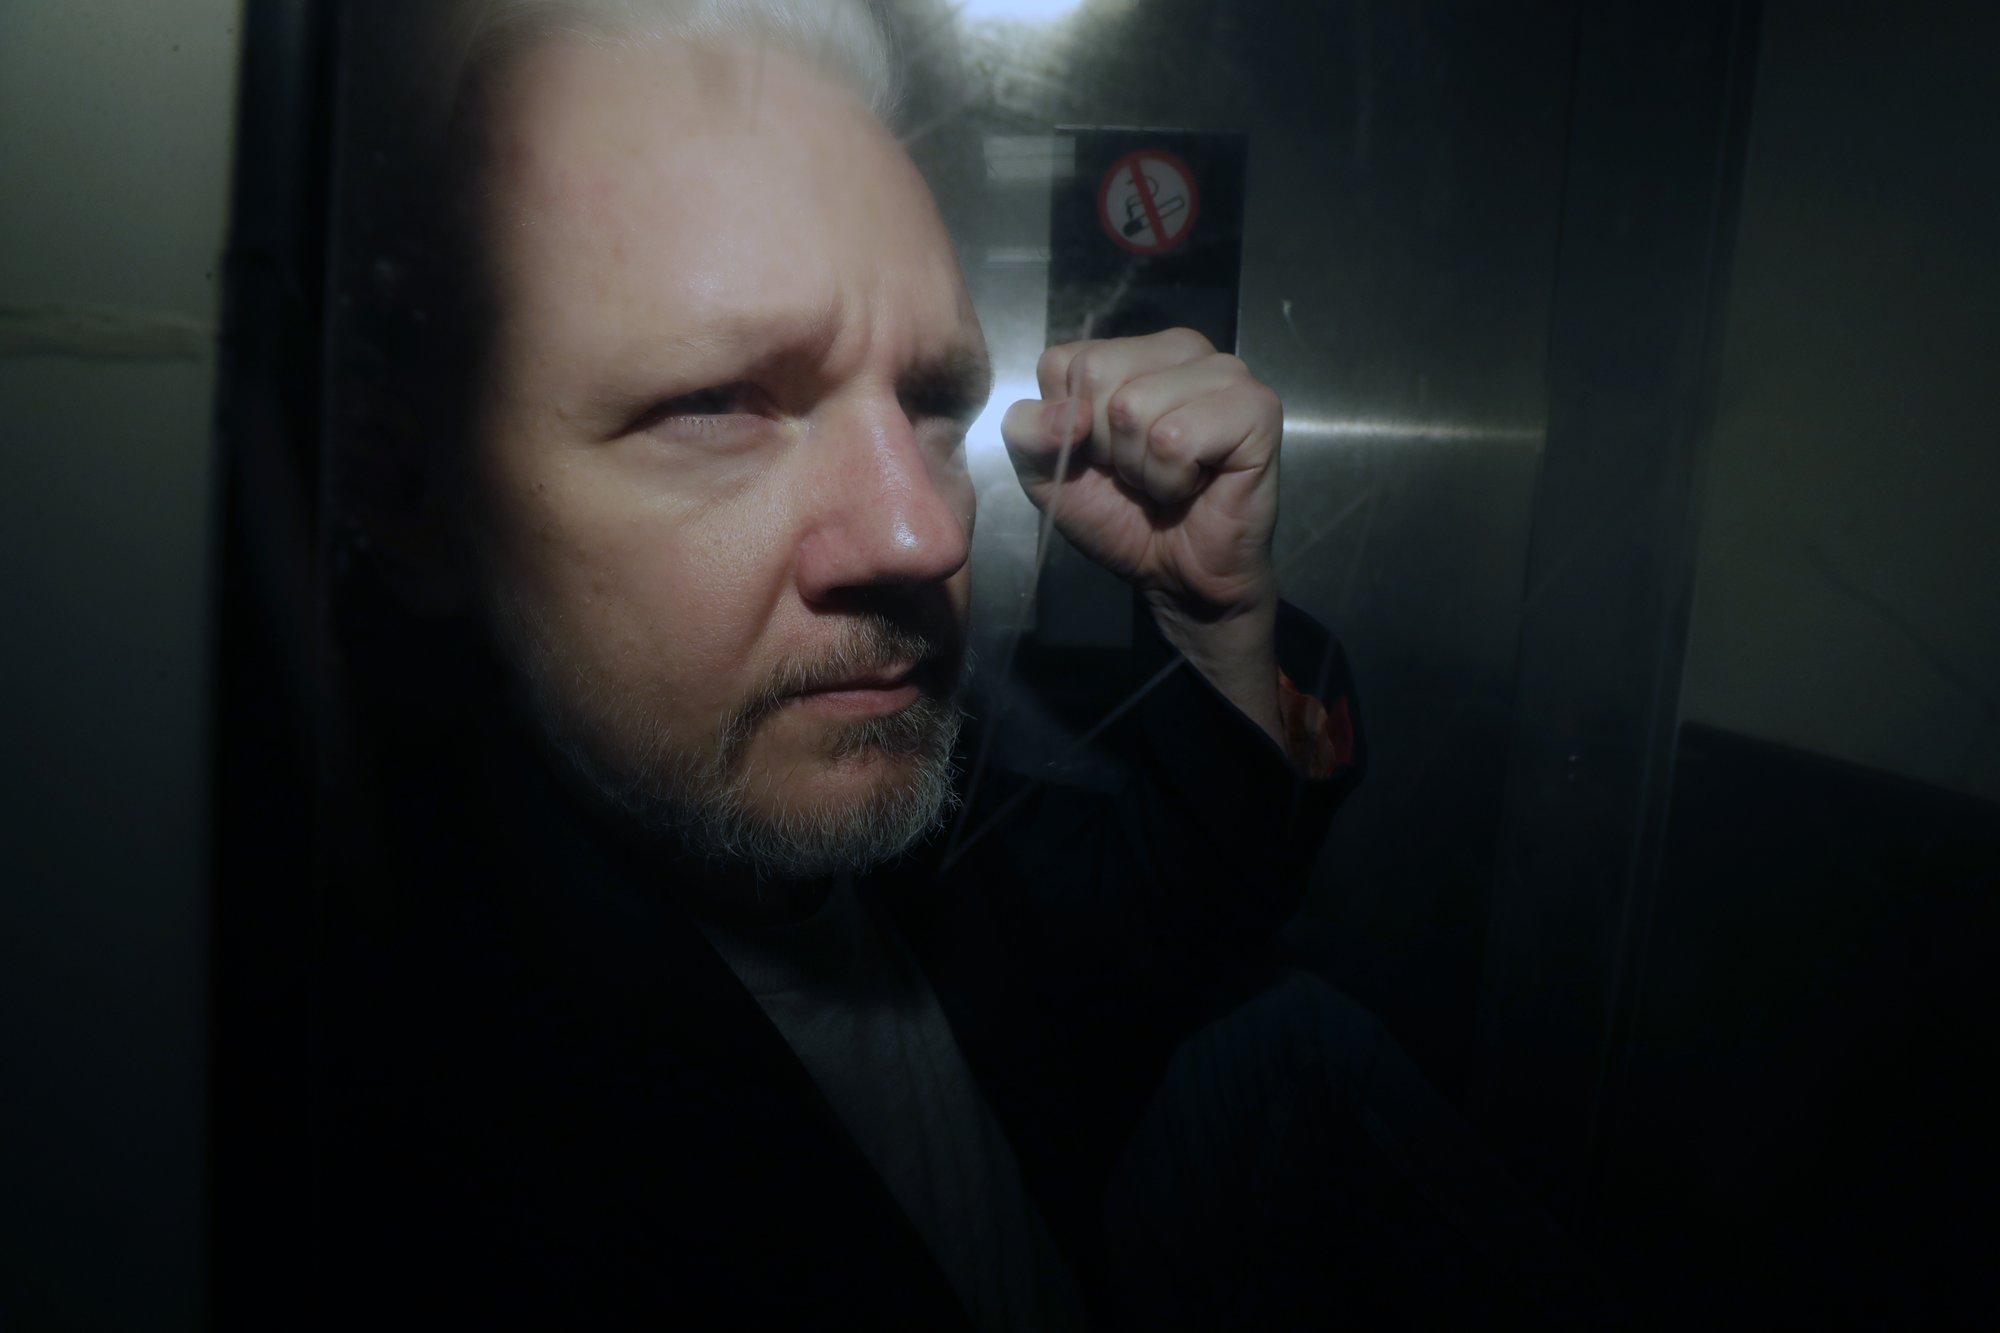 Julian Assange - May 1, 2019